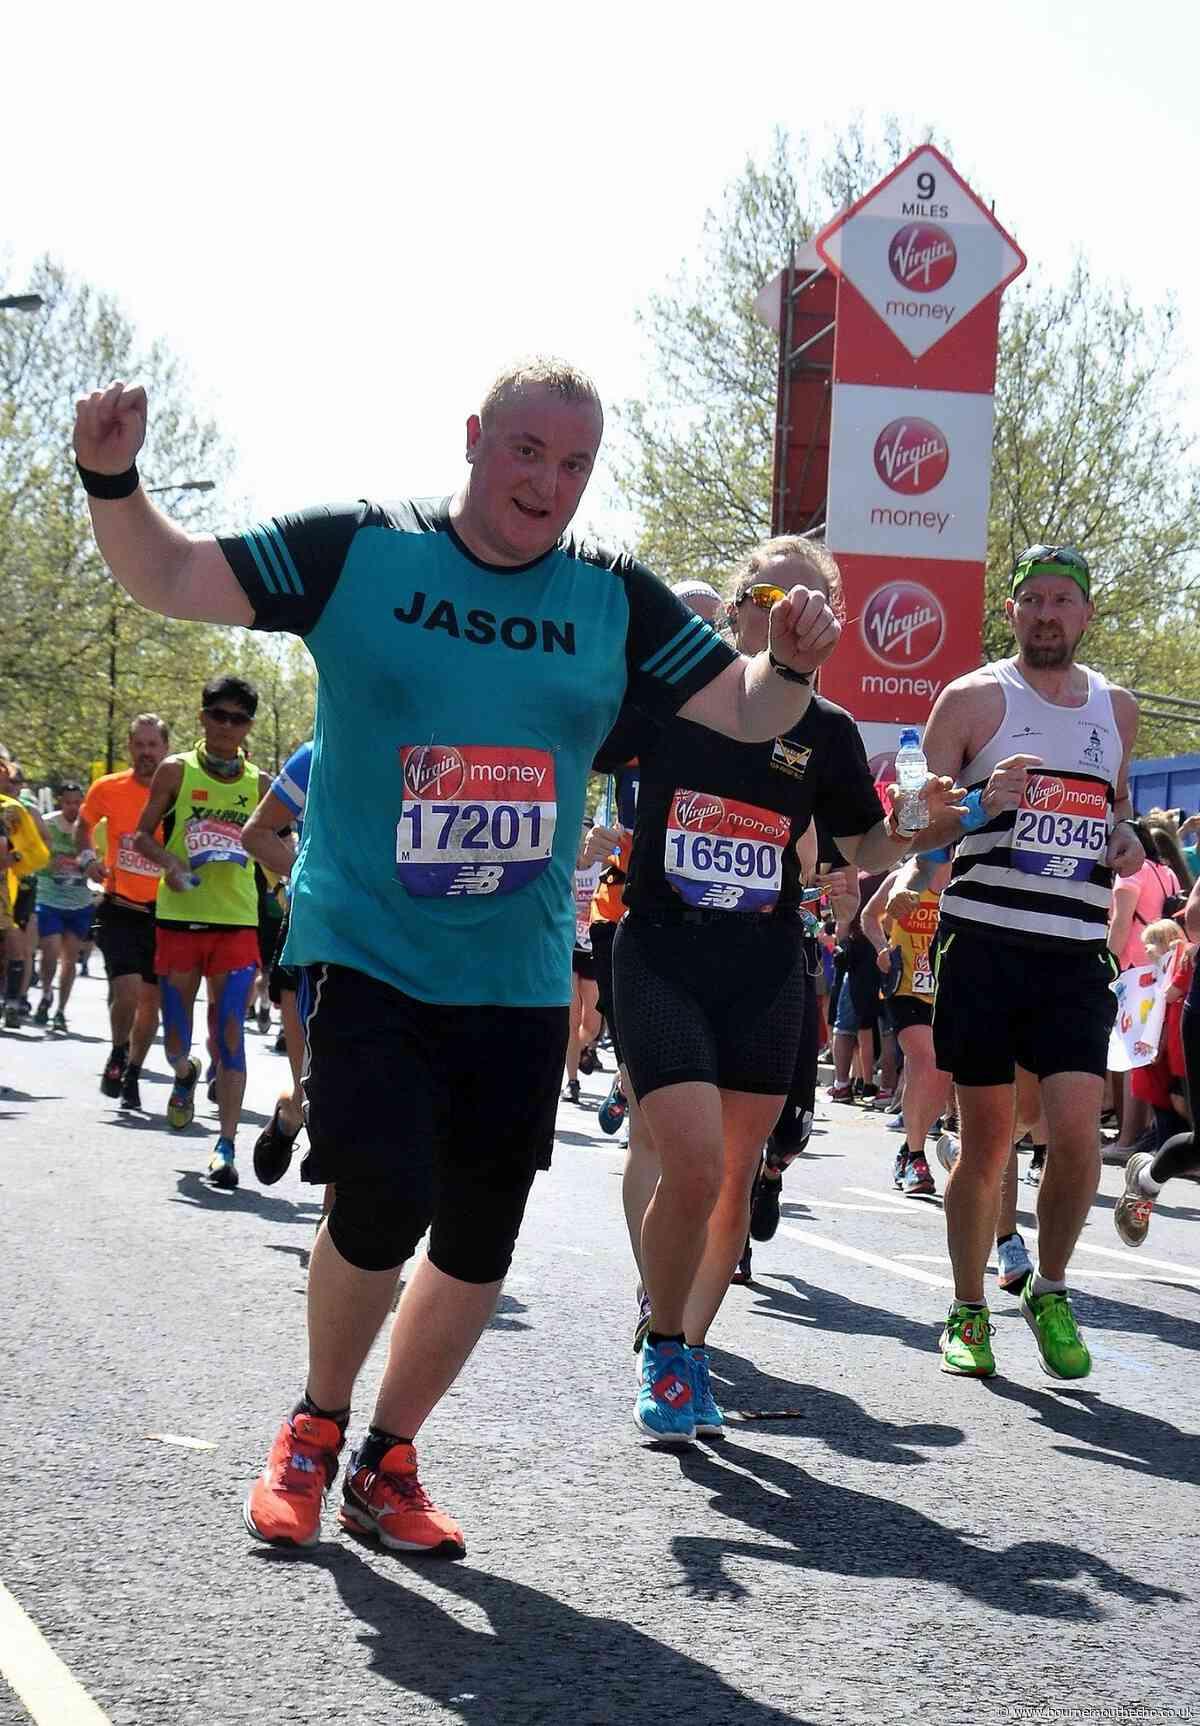 Heathrow hotel boss from Bournemouth prepares for fifth London Marathon